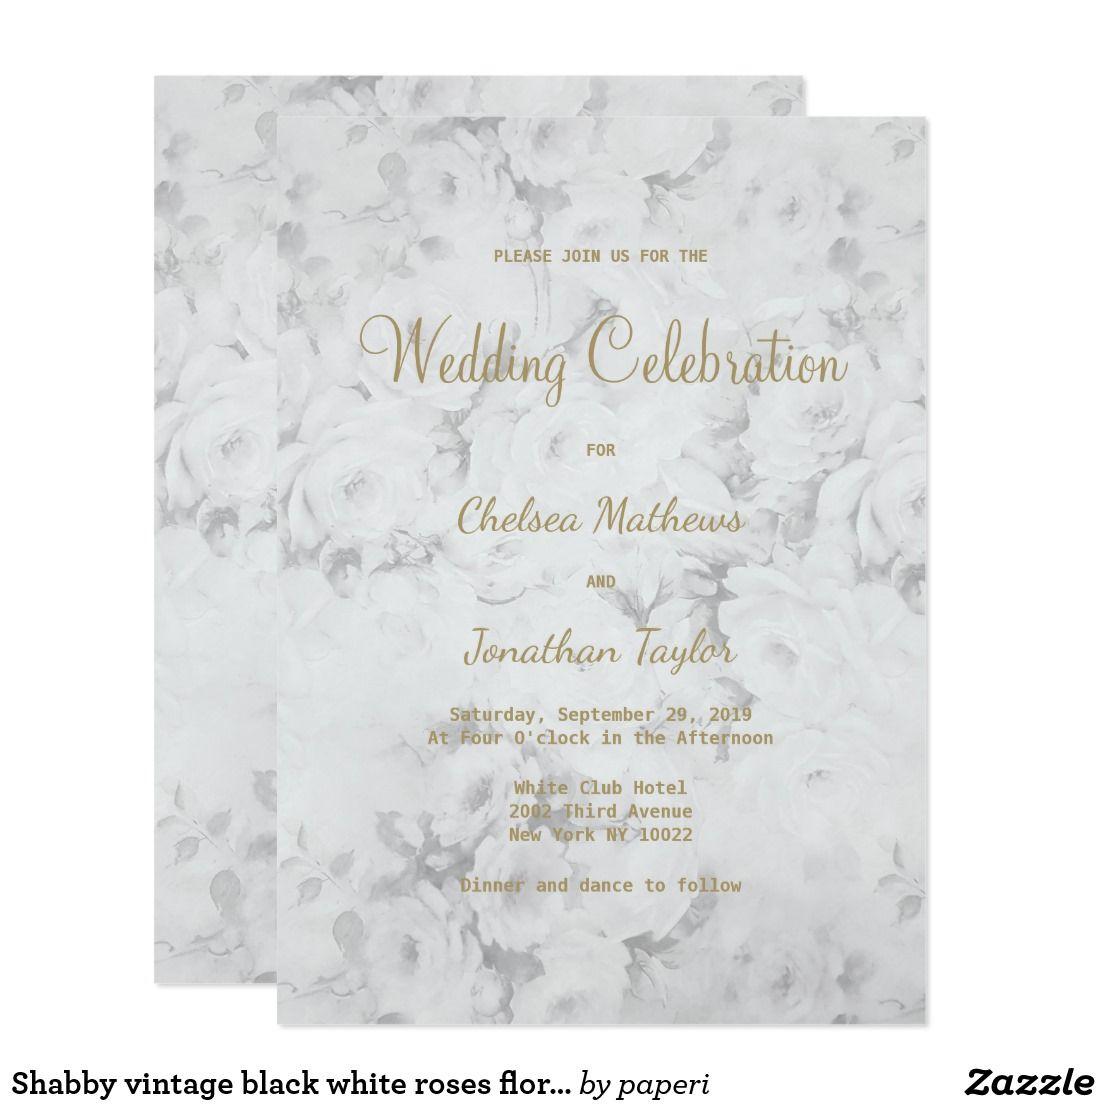 Shabby Vintage Black White Roses Floral Wedding Invitations